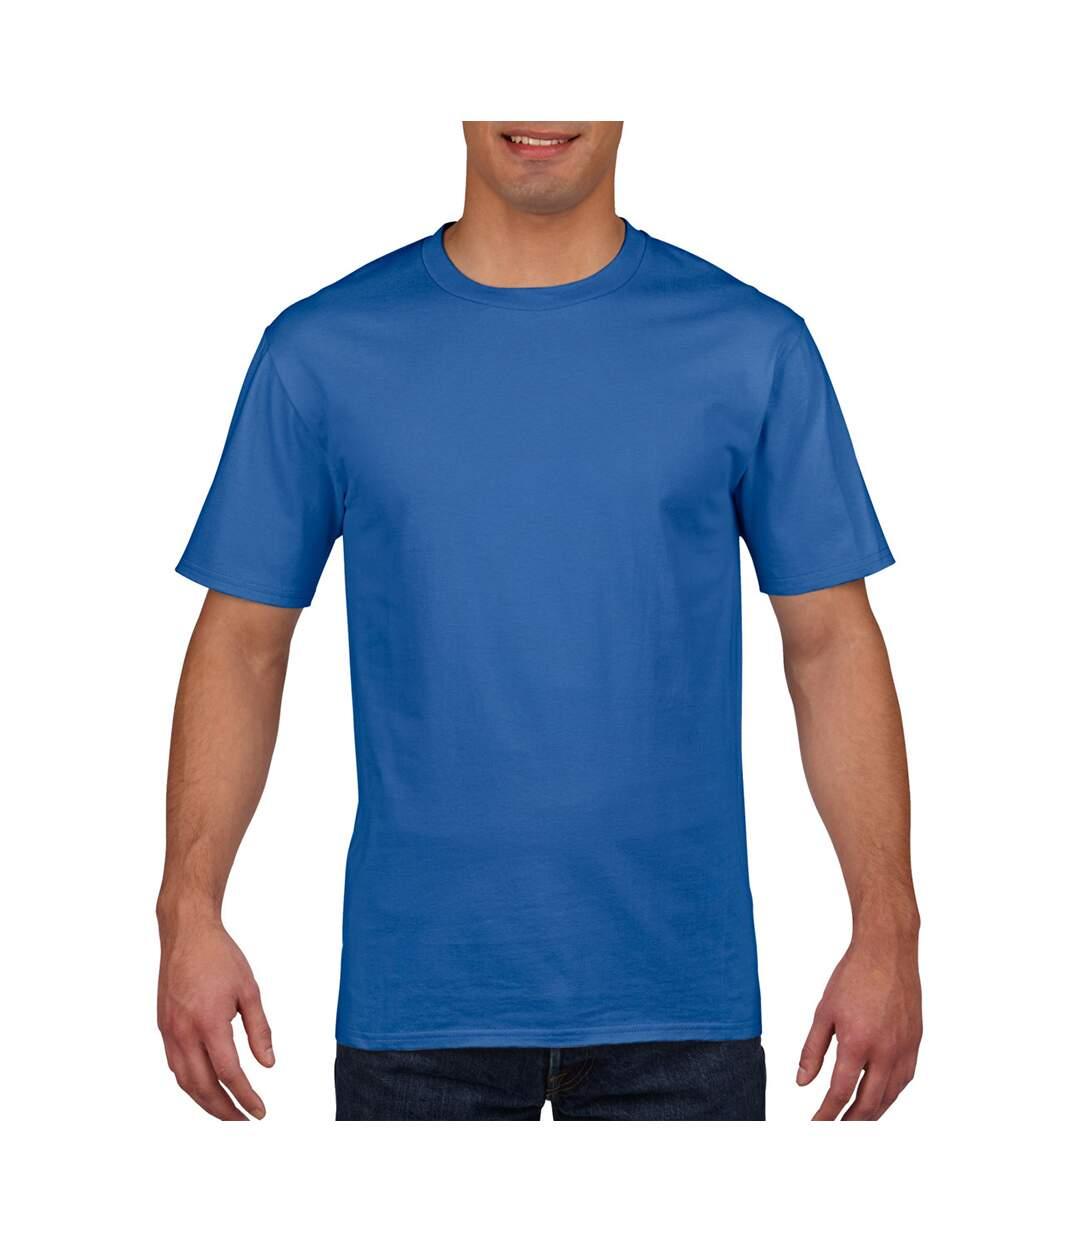 Gildan Mens Premium Cotton Ring Spun Short Sleeve T-Shirt (Royal) - UTBC480